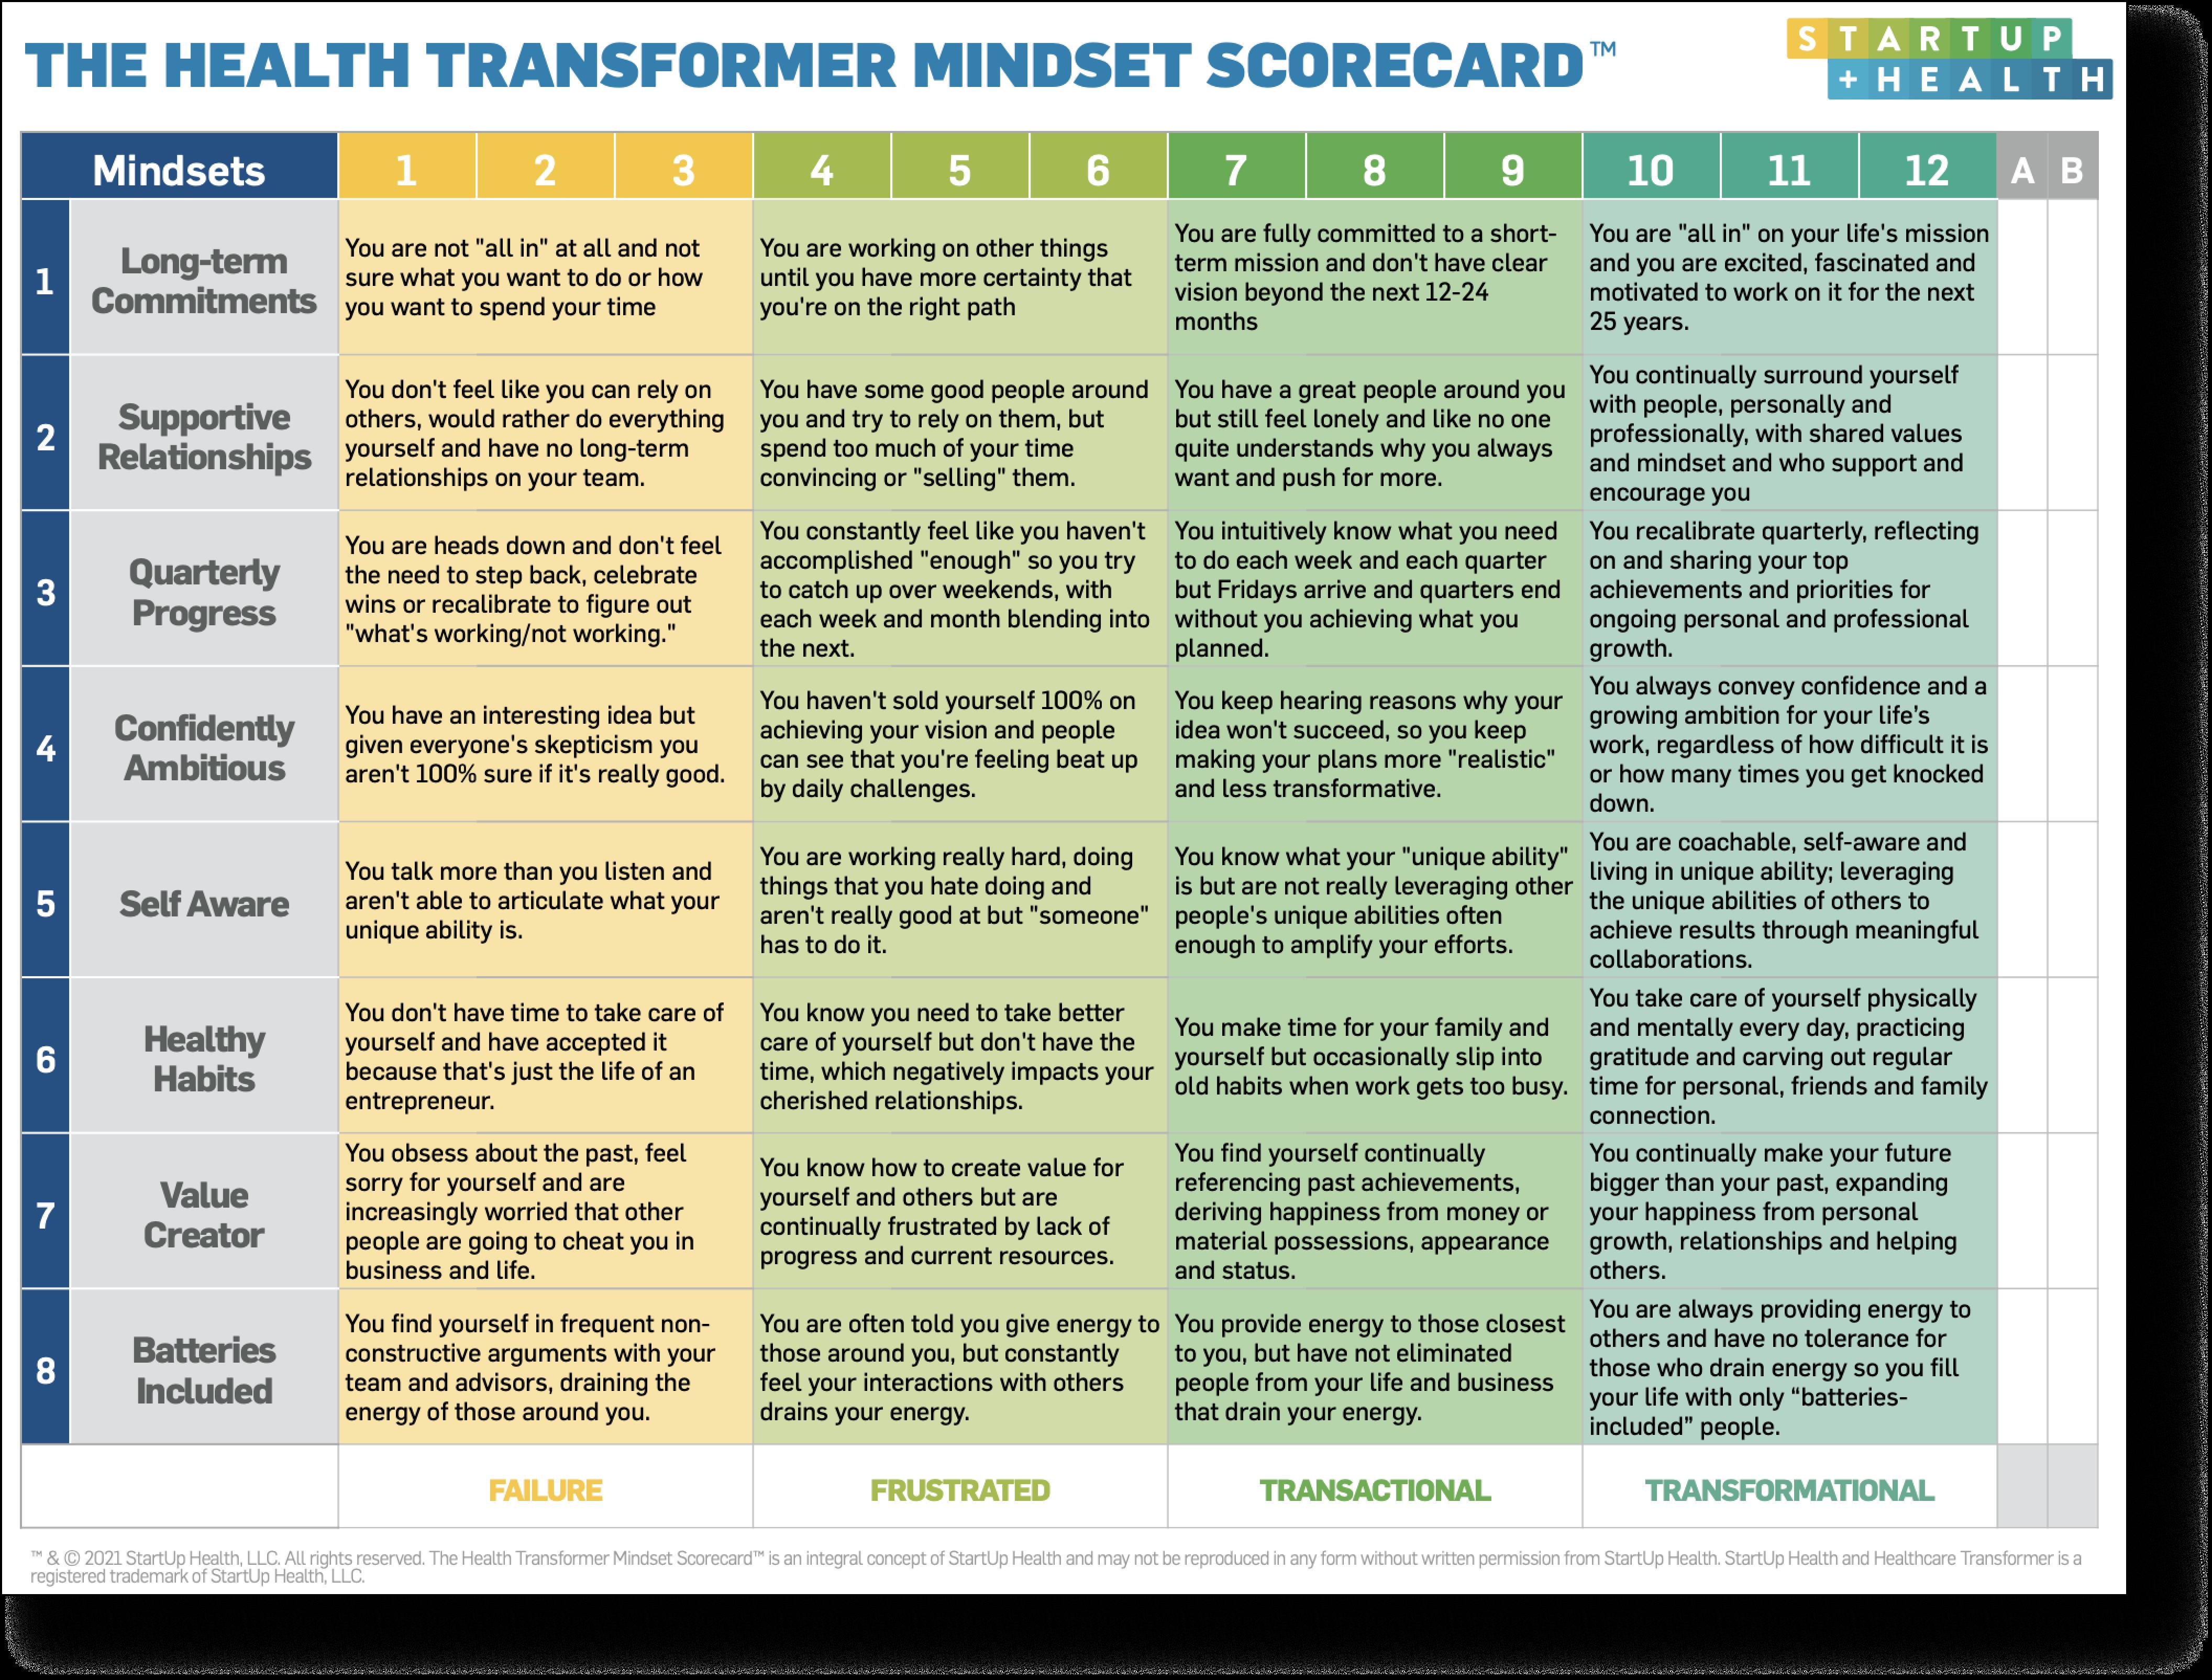 the health transformer mindset scorecard